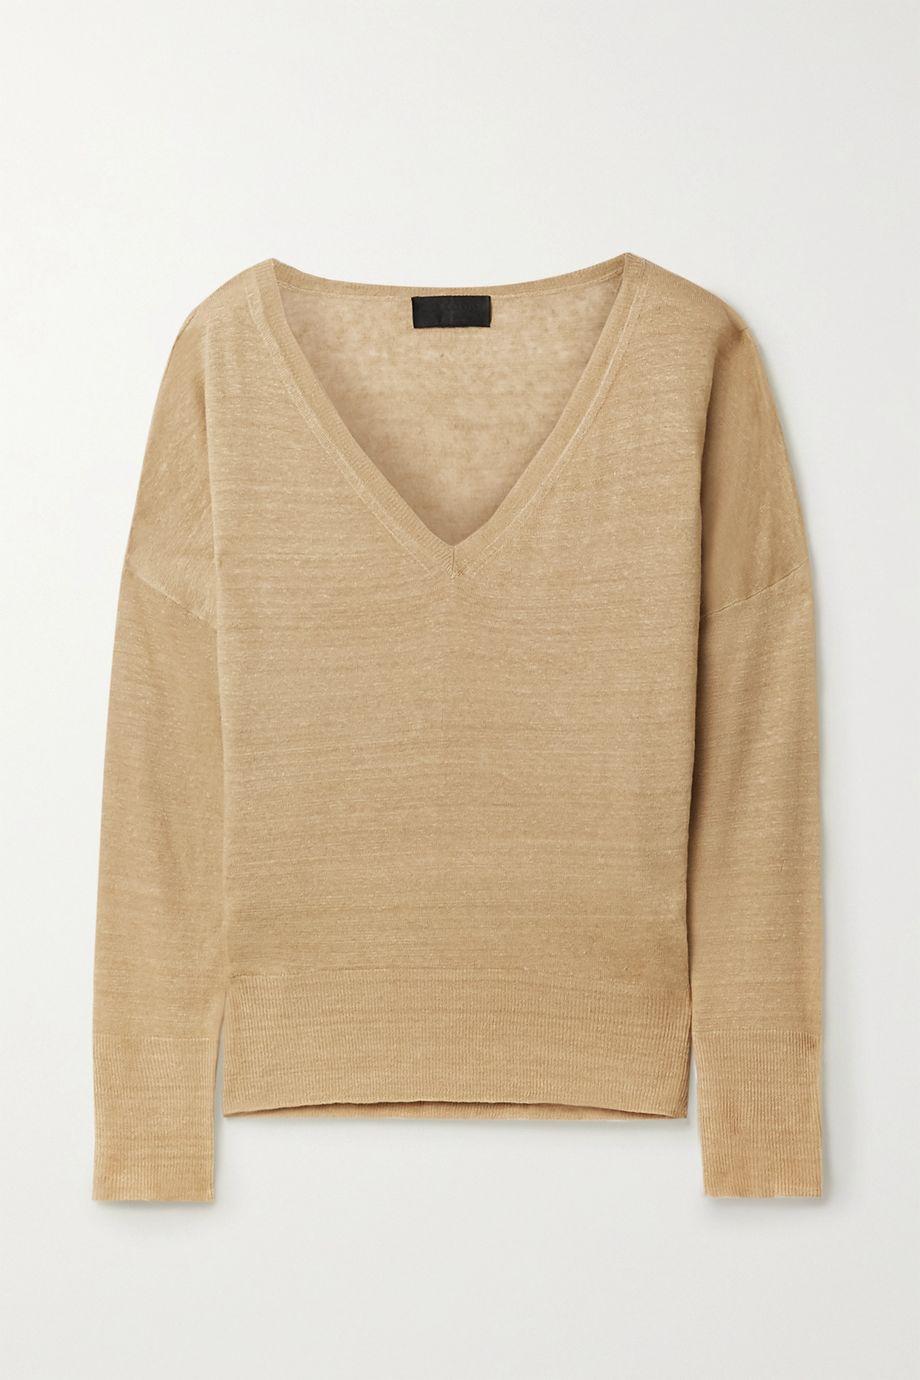 Nili Lotan Ginny slub linen sweater